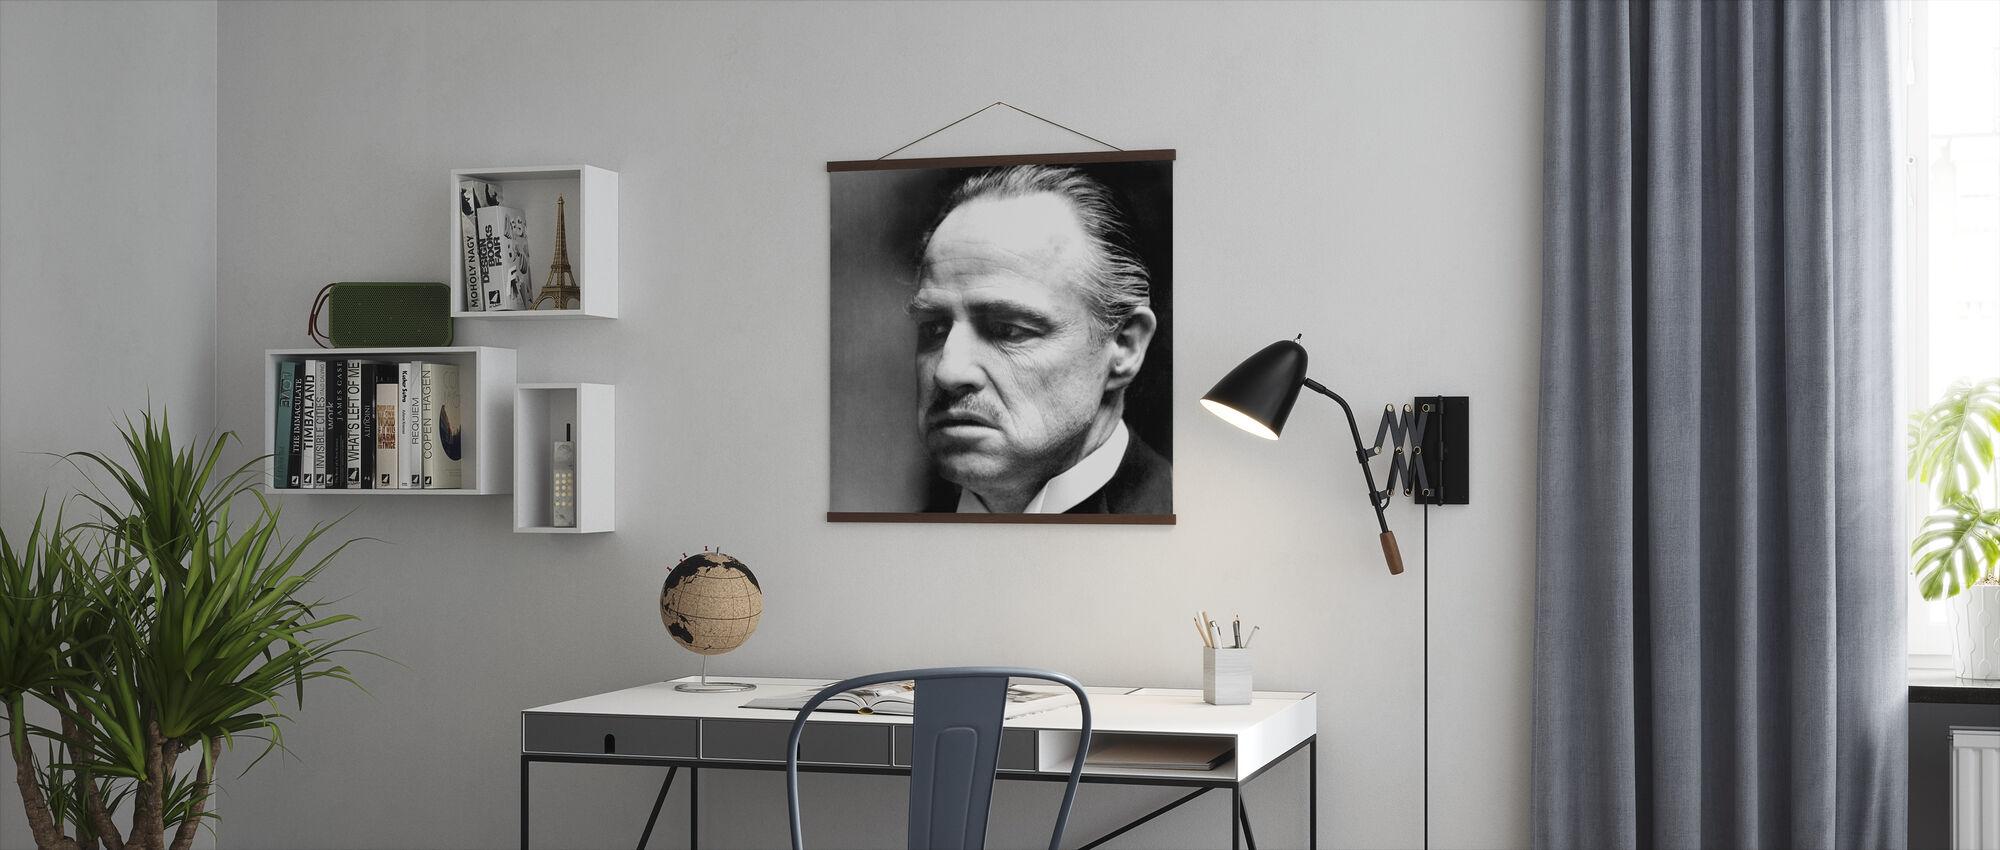 De peetvader - Don Vito Corleone - Poster - Kantoor